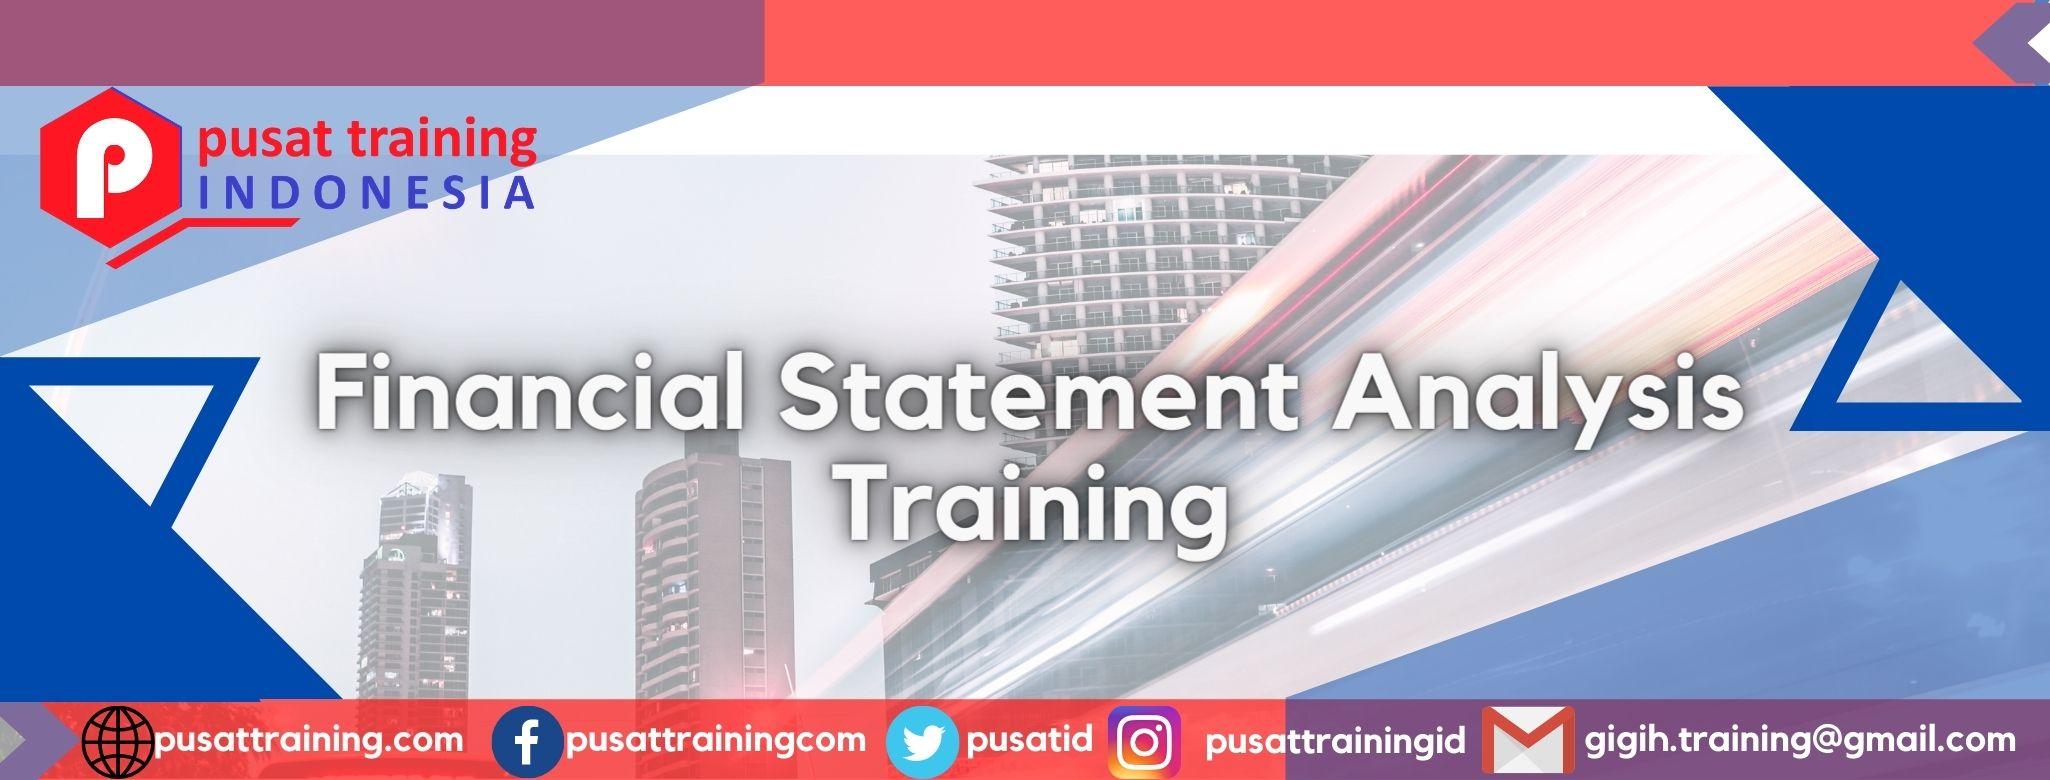 Financial-Statement-Analysis-Training